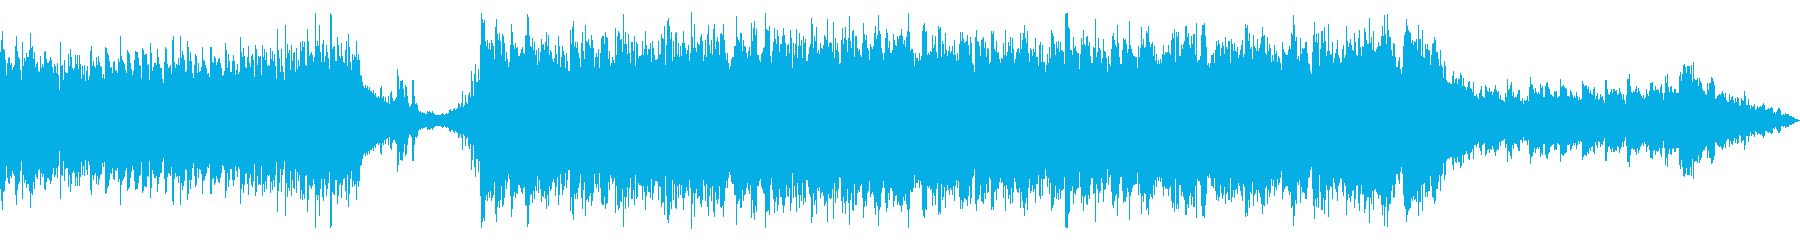 Top Runner 30秒の再生済みの波形